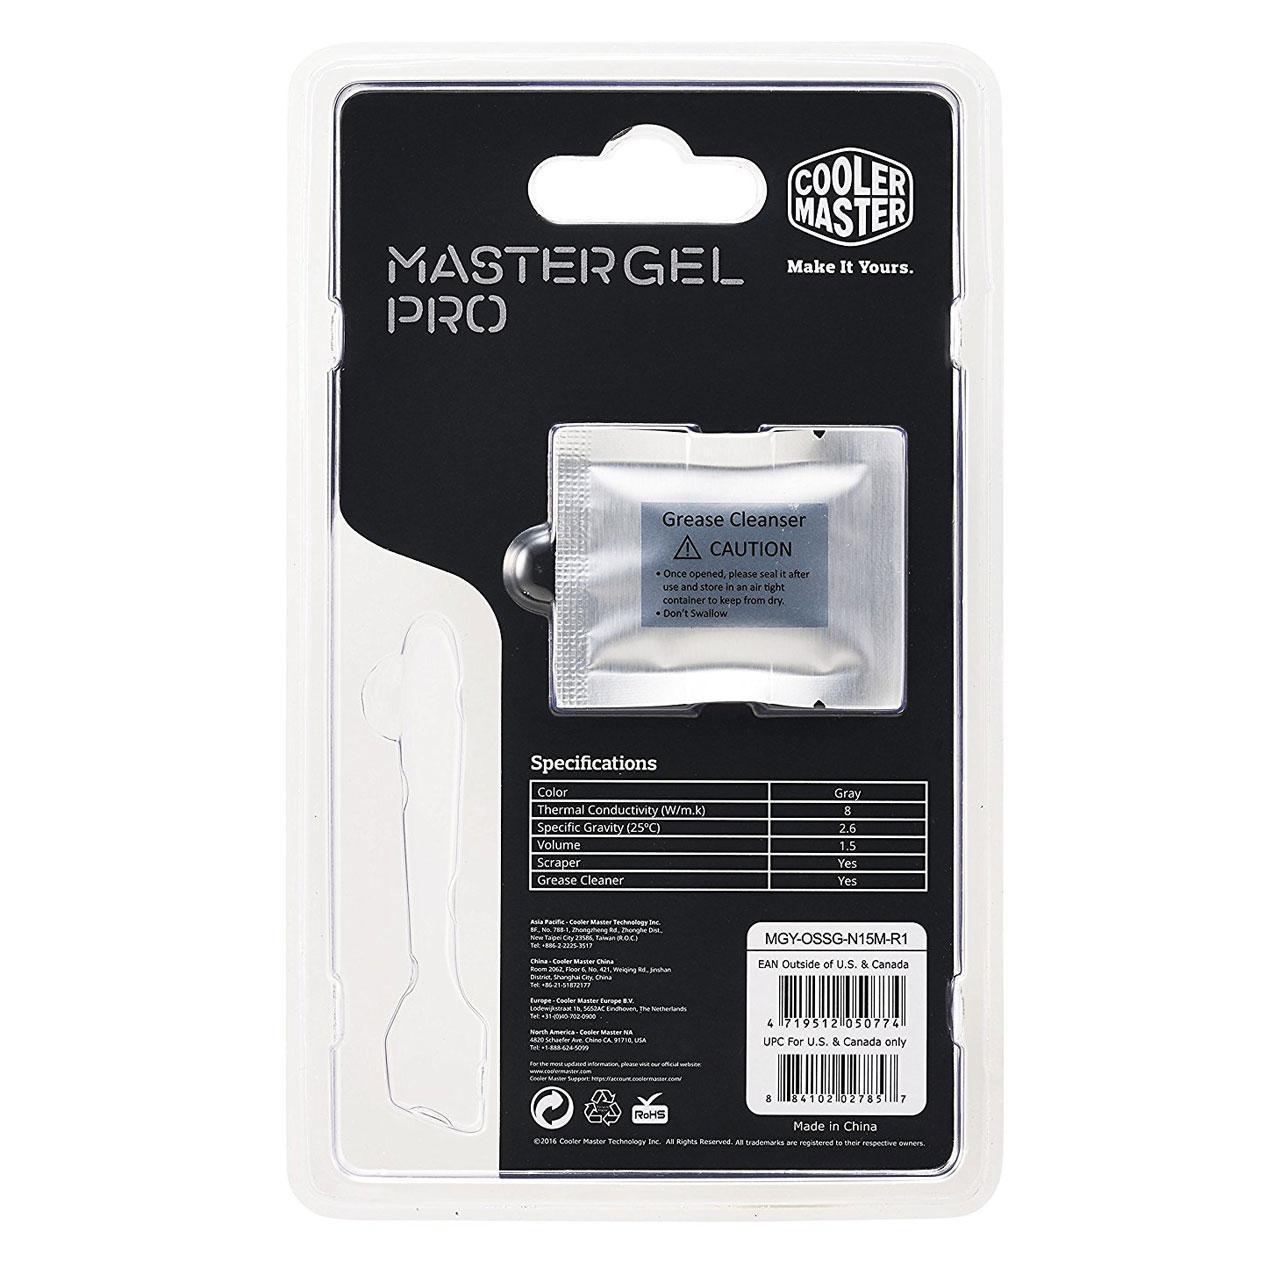 خمیر سیلیکون حرفه ای کولر مستر مدل Master Gel Pro